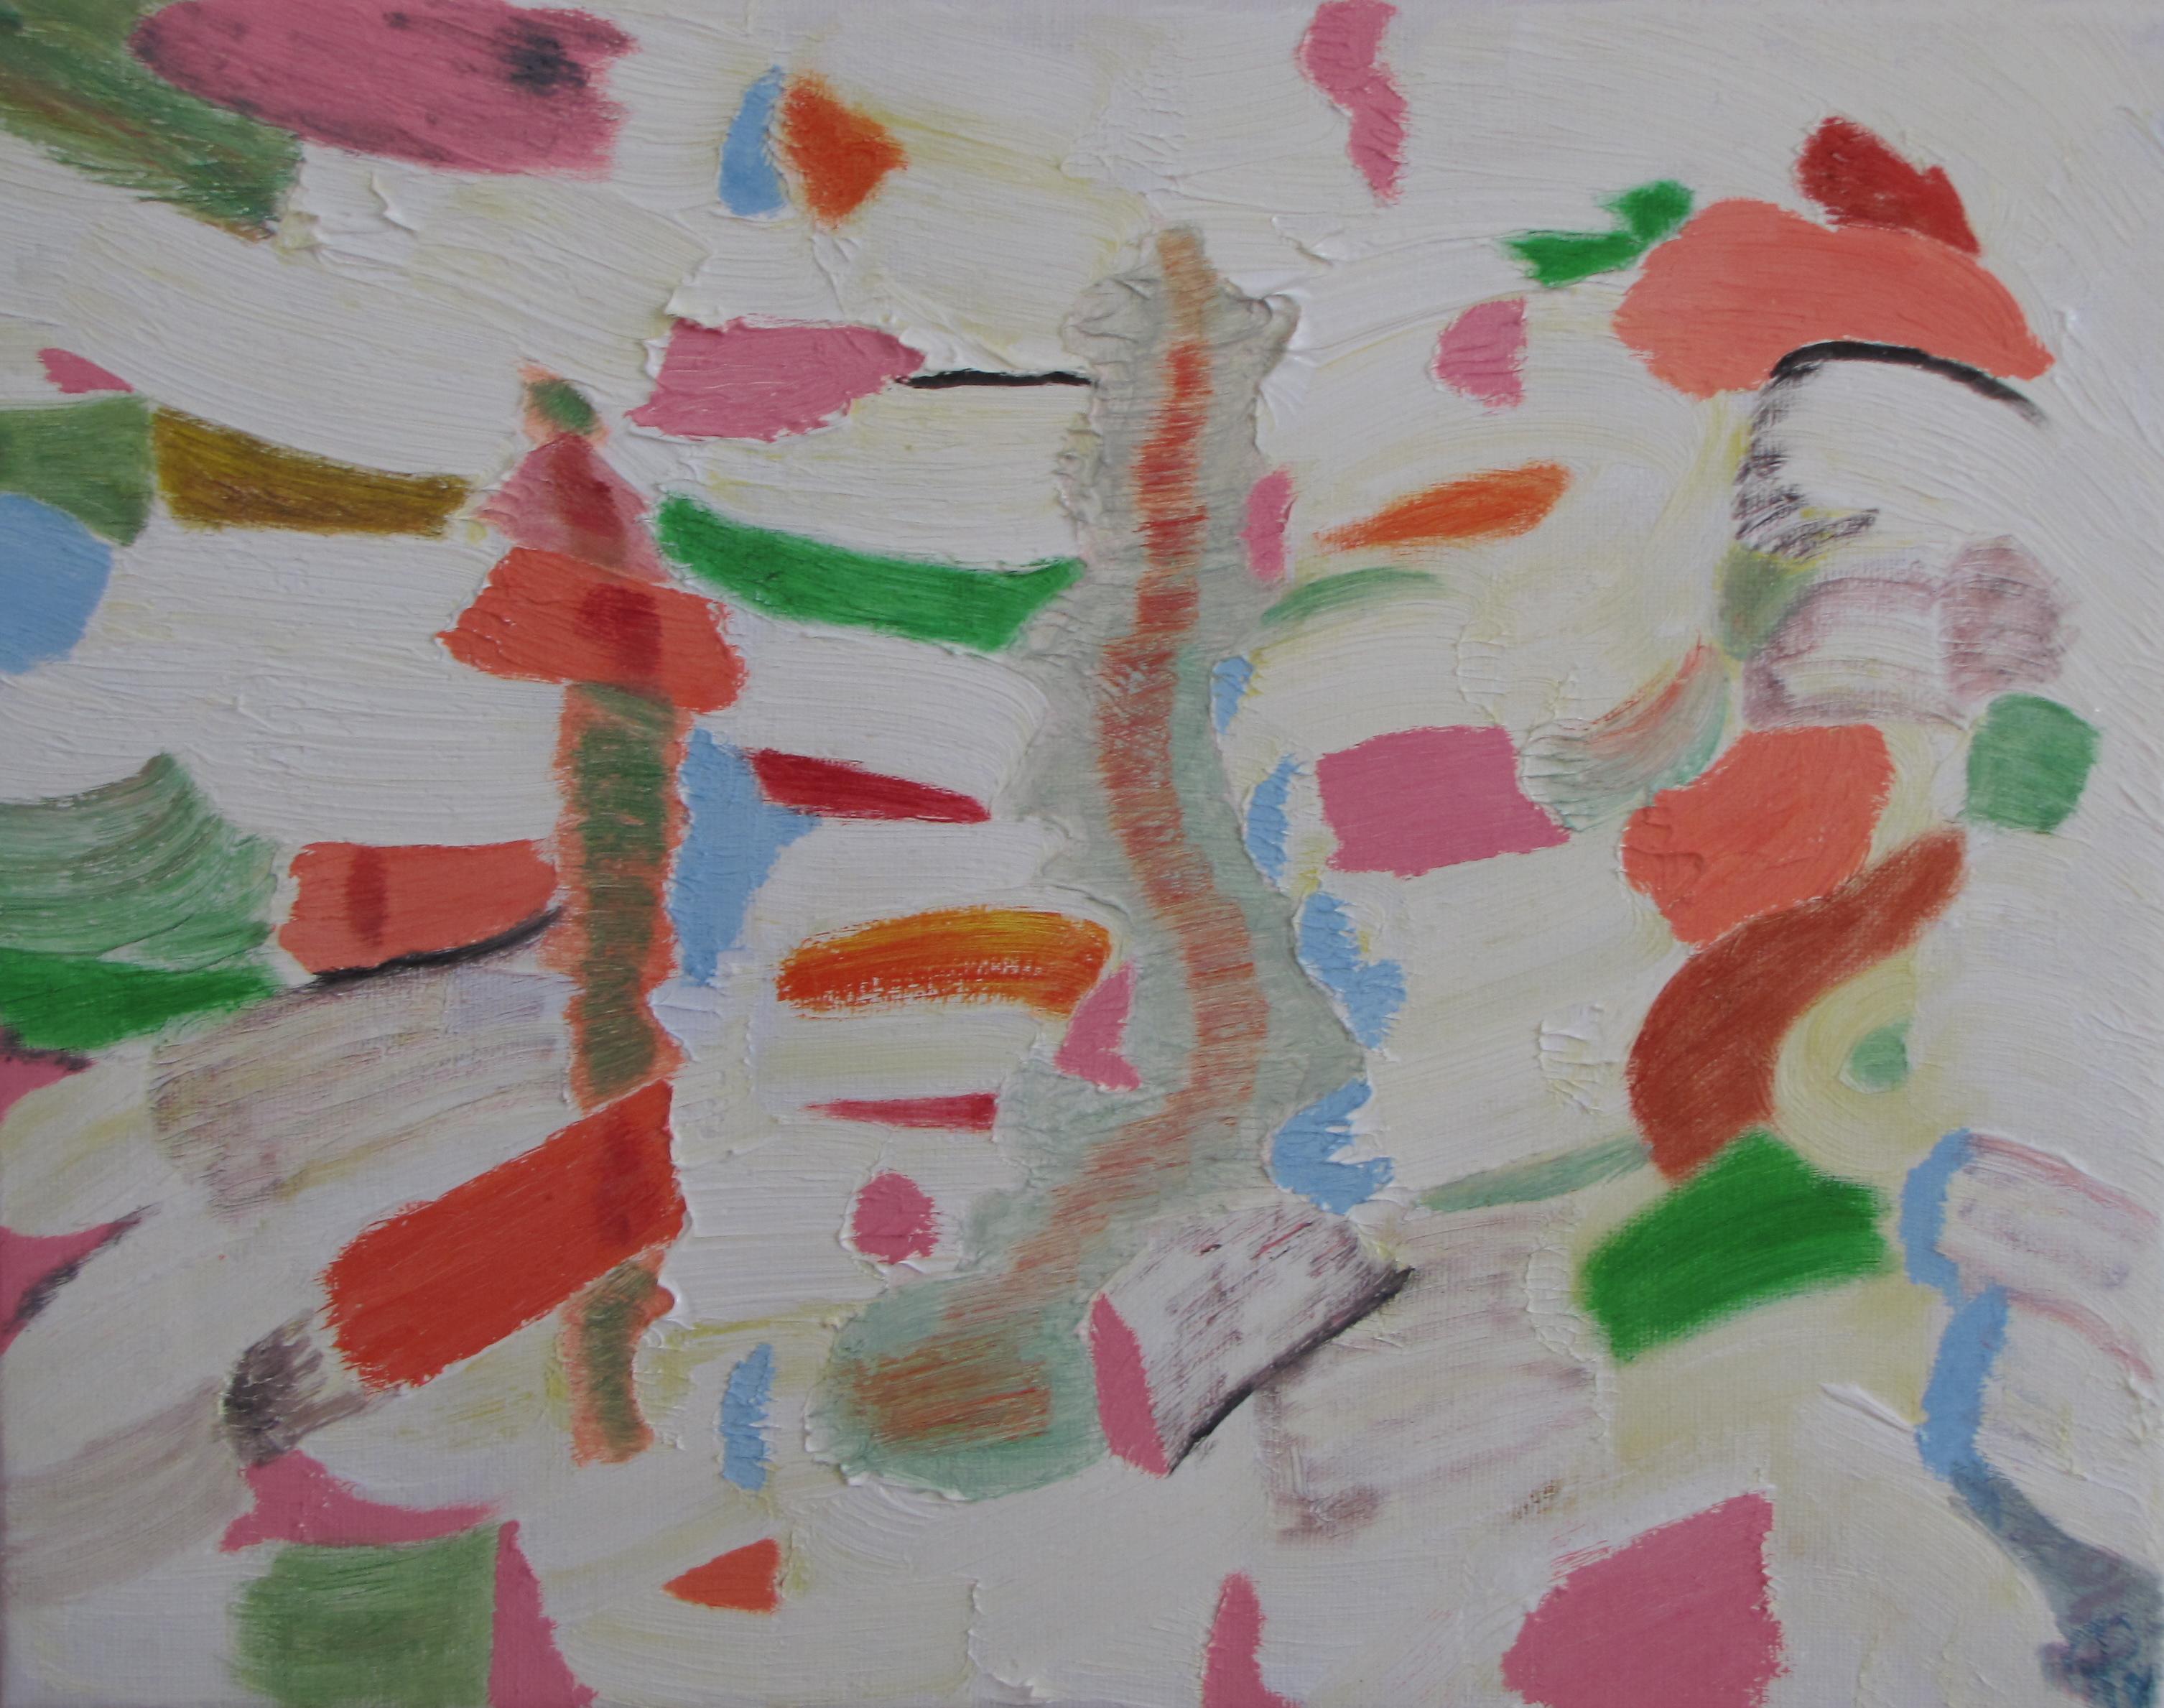 Pillars, Russell Steven Powell oil on canvas, 14x11